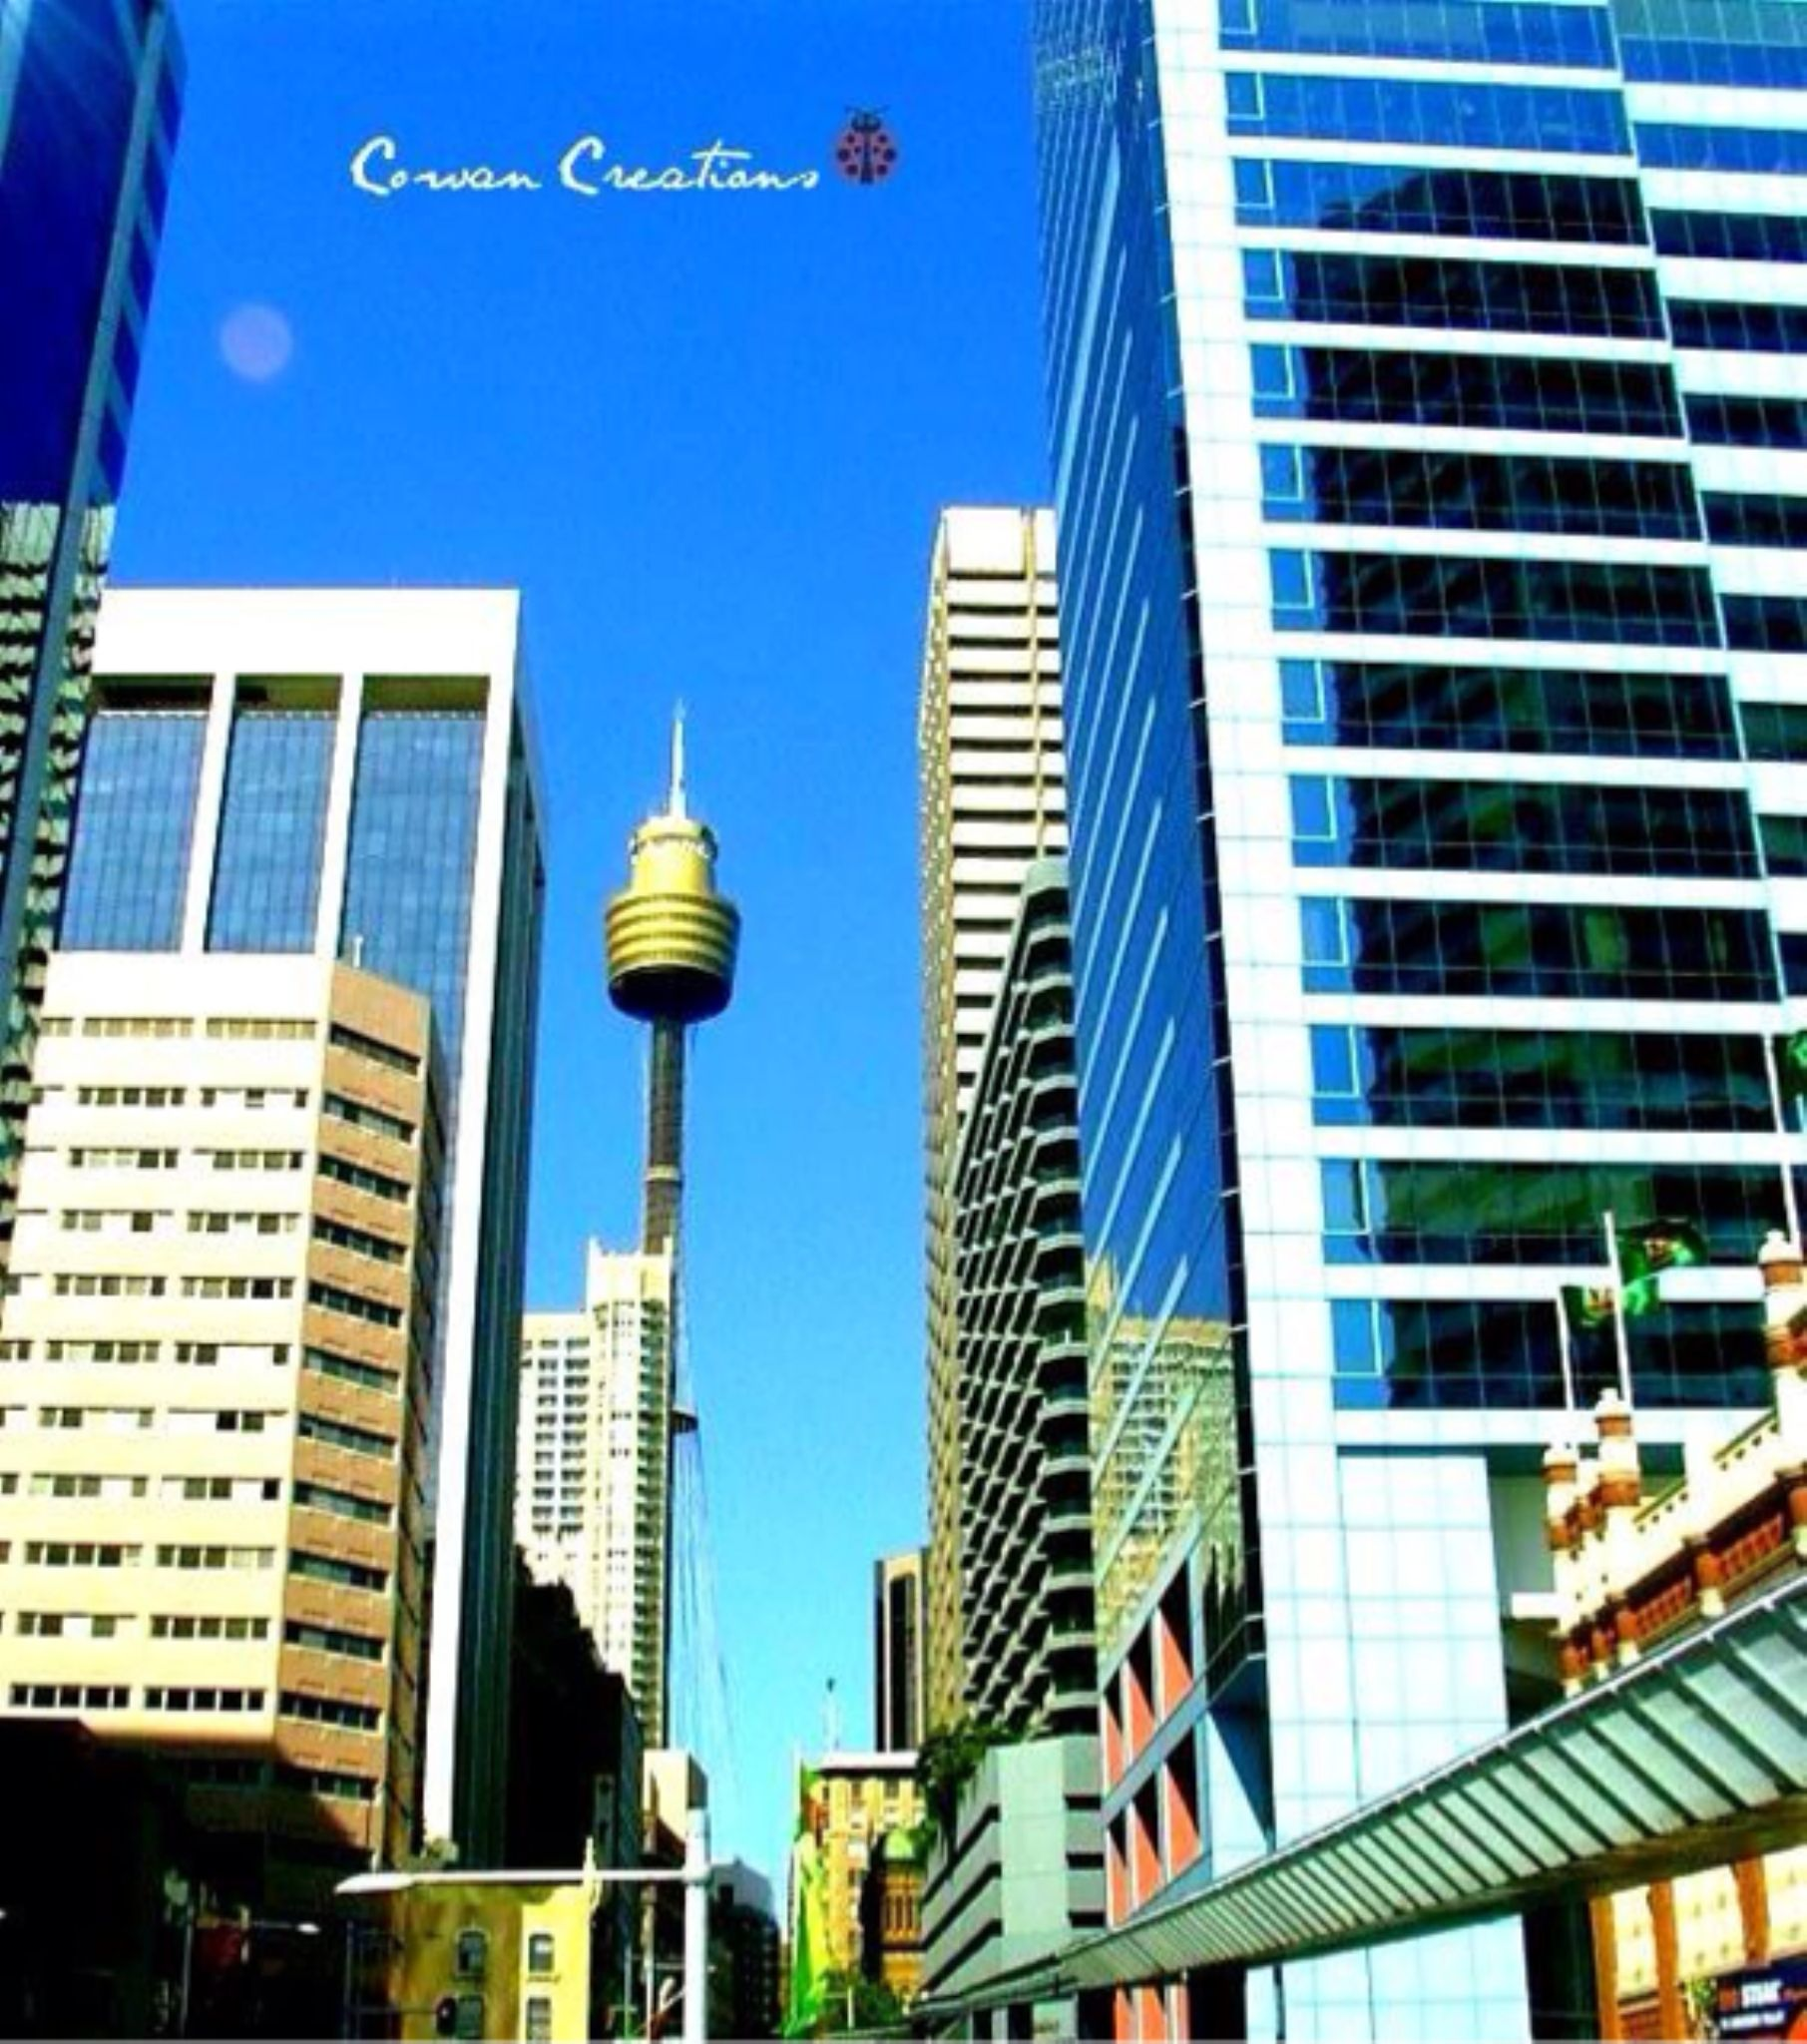 Sydney by CowanCreations